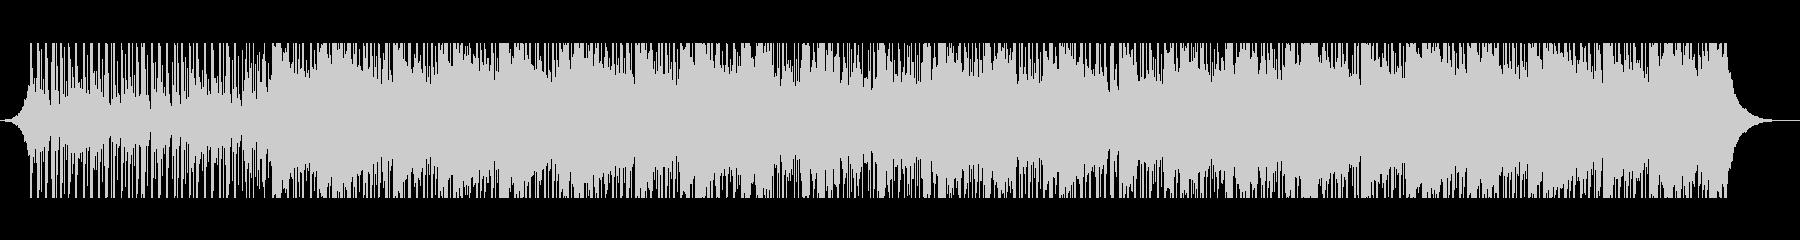 Explainer Video's unreproduced waveform